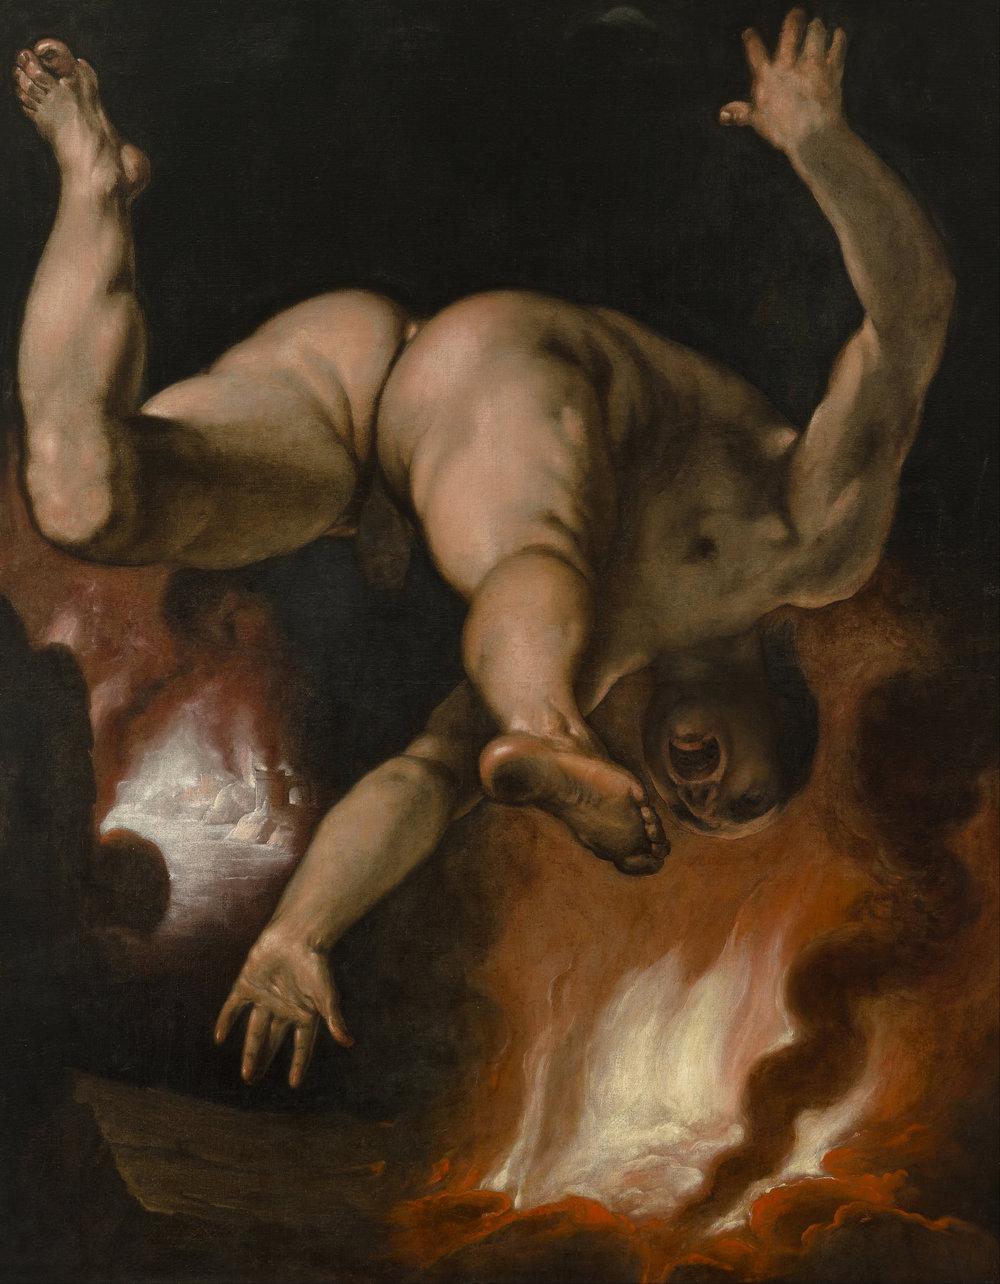 La caída de Ixión (1588) - Cornelis Van Haarlem.